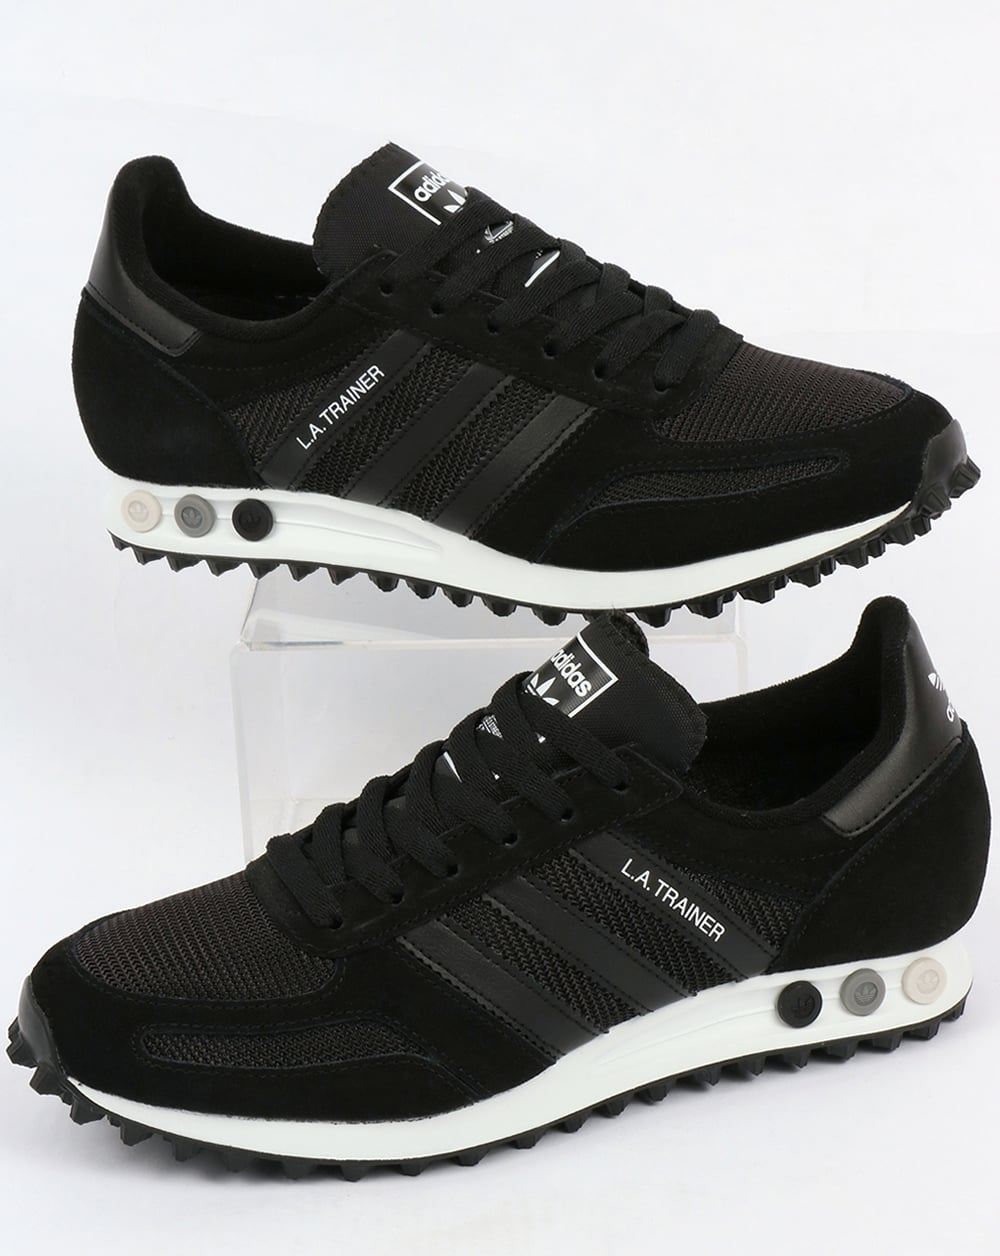 Ordenador portátil intelectual Ru  Adidas La Trainer Og Black/black/white,shoes,running,mens,originals